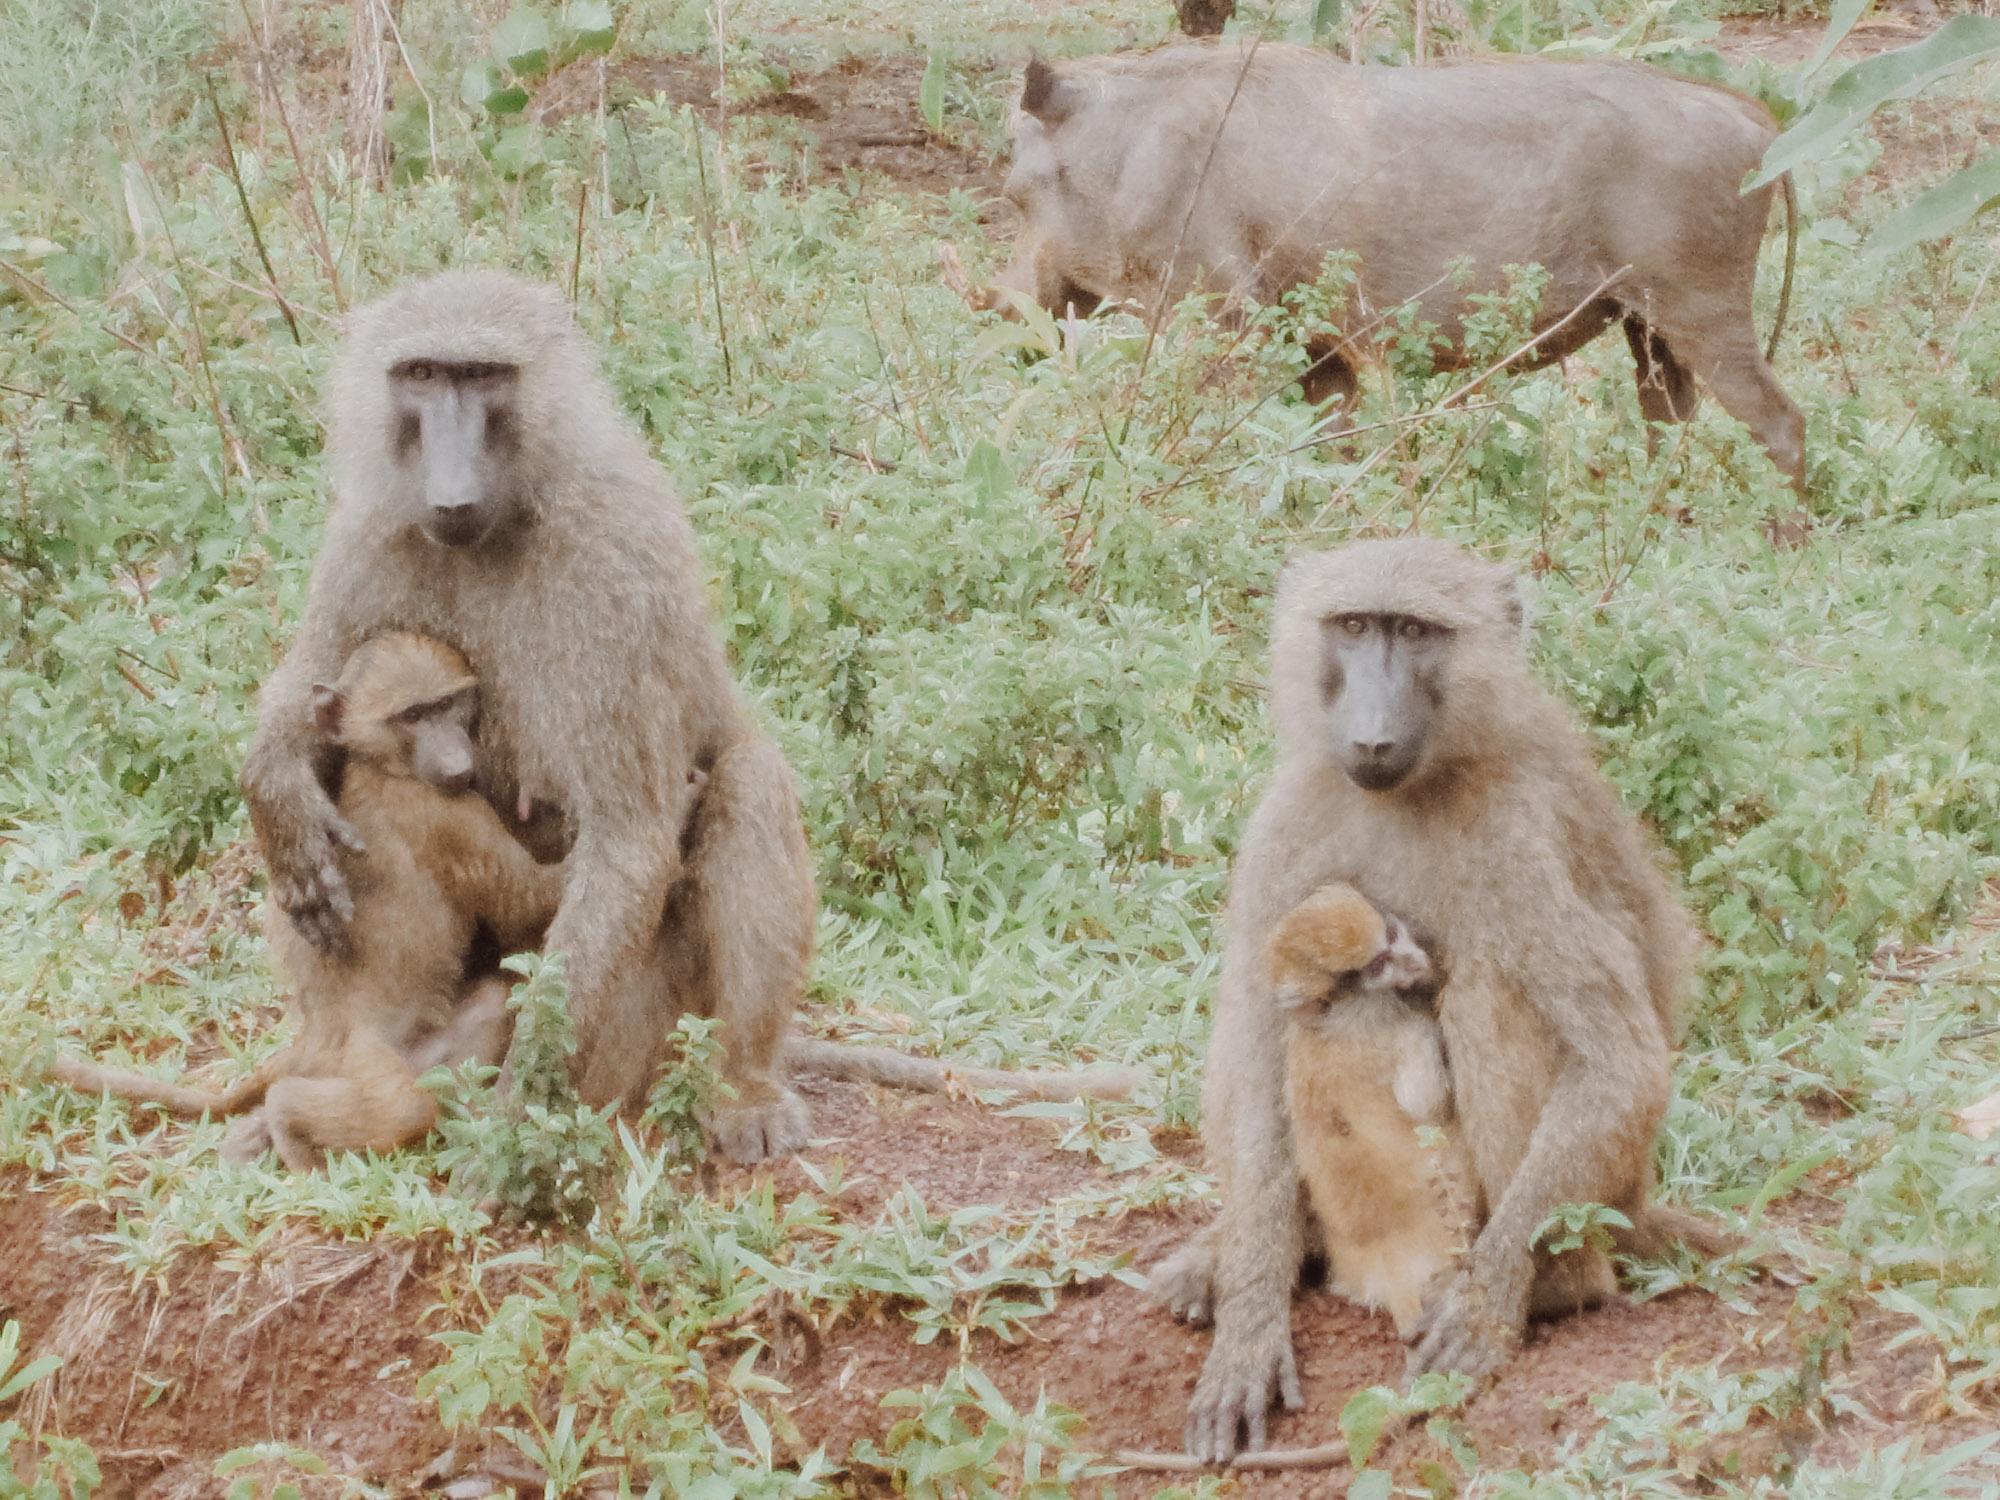 Friends encountered in Mole National Park | Photo by Caroline Taft,  The Brazen Gourmand